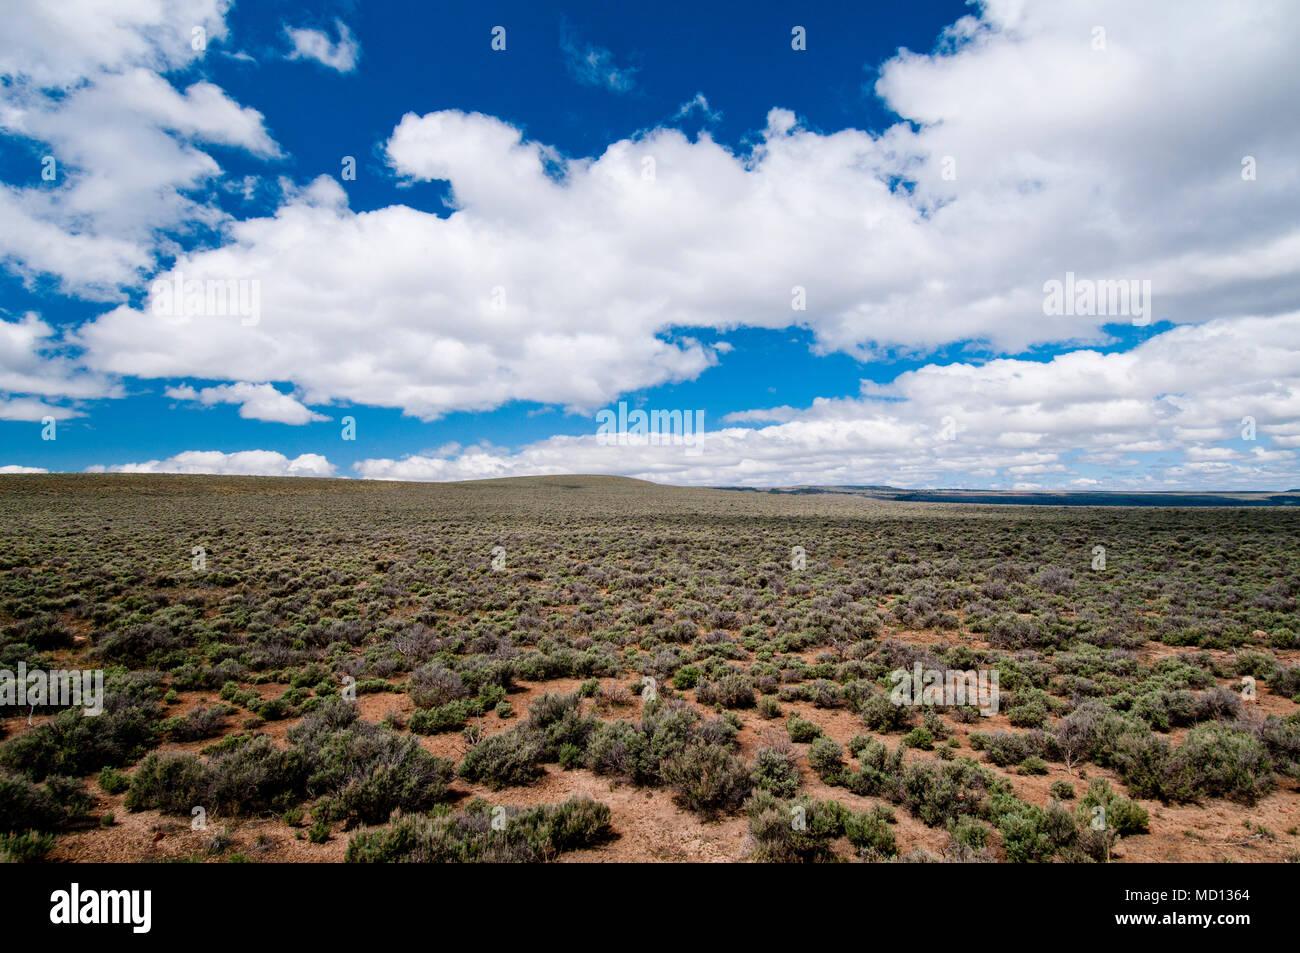 'Sagebrush sea' in the high desert of SE Oregon - Stock Image